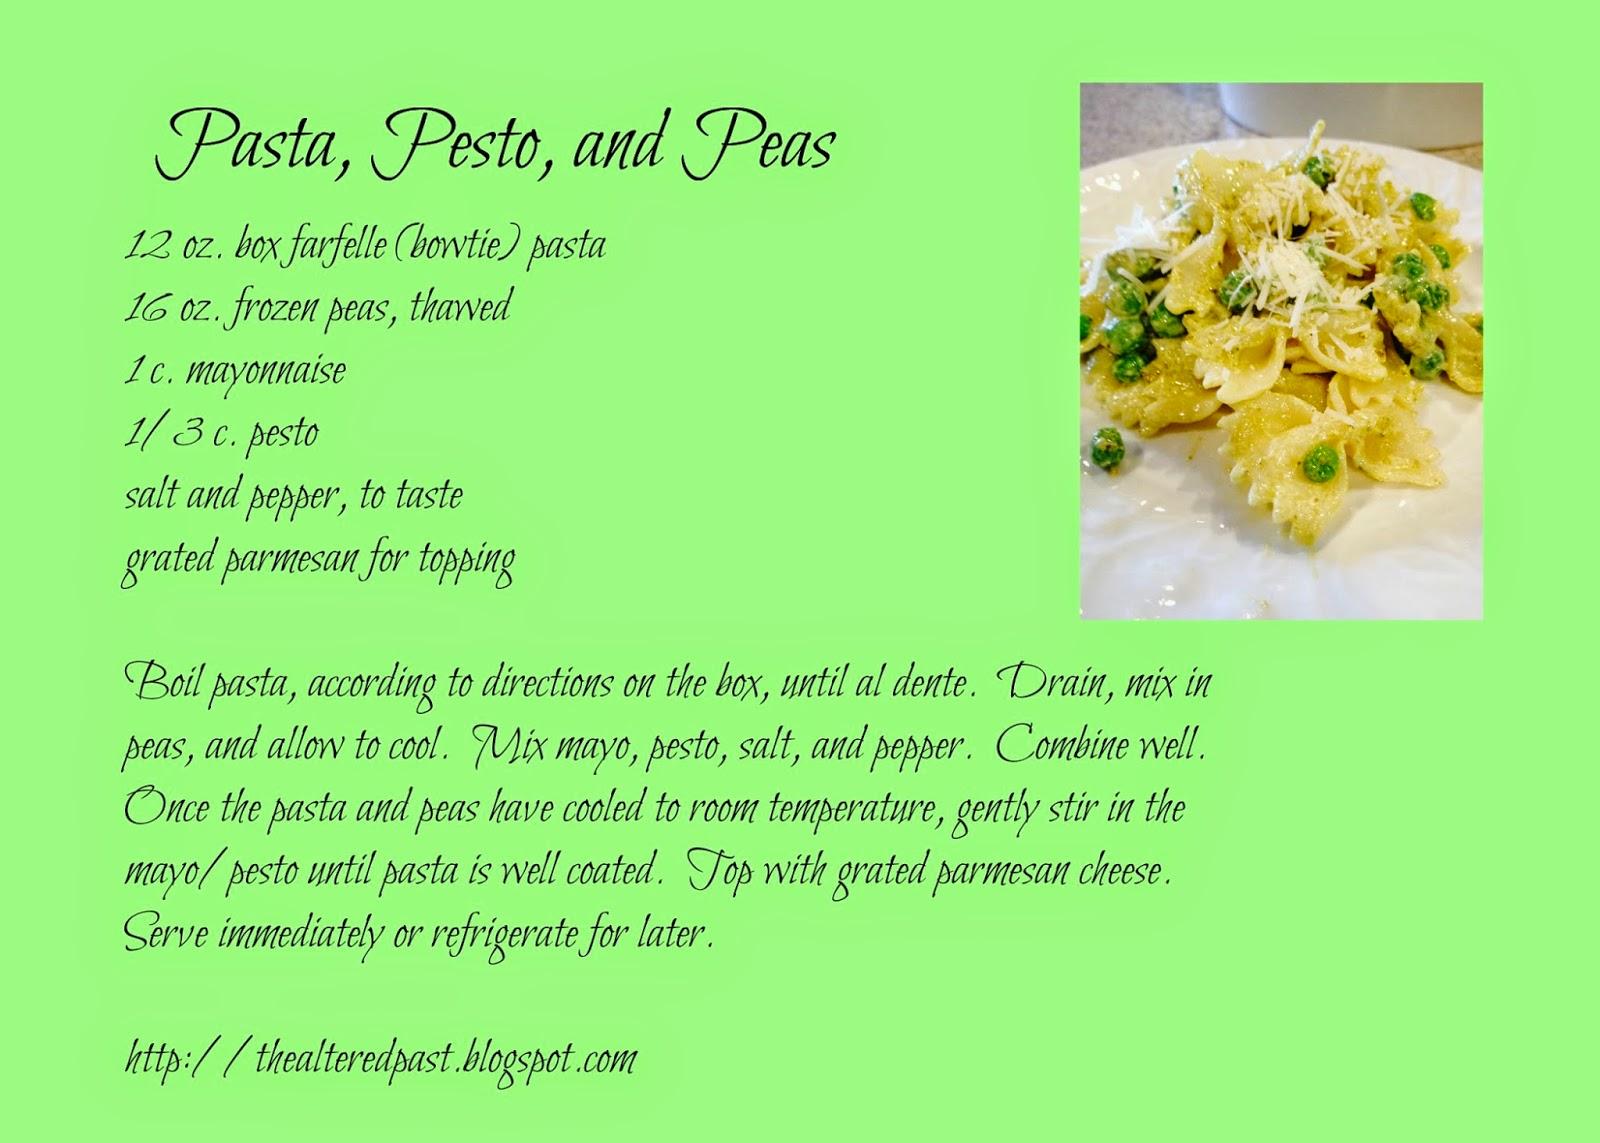 pasta-pesto-and-peas-recipe